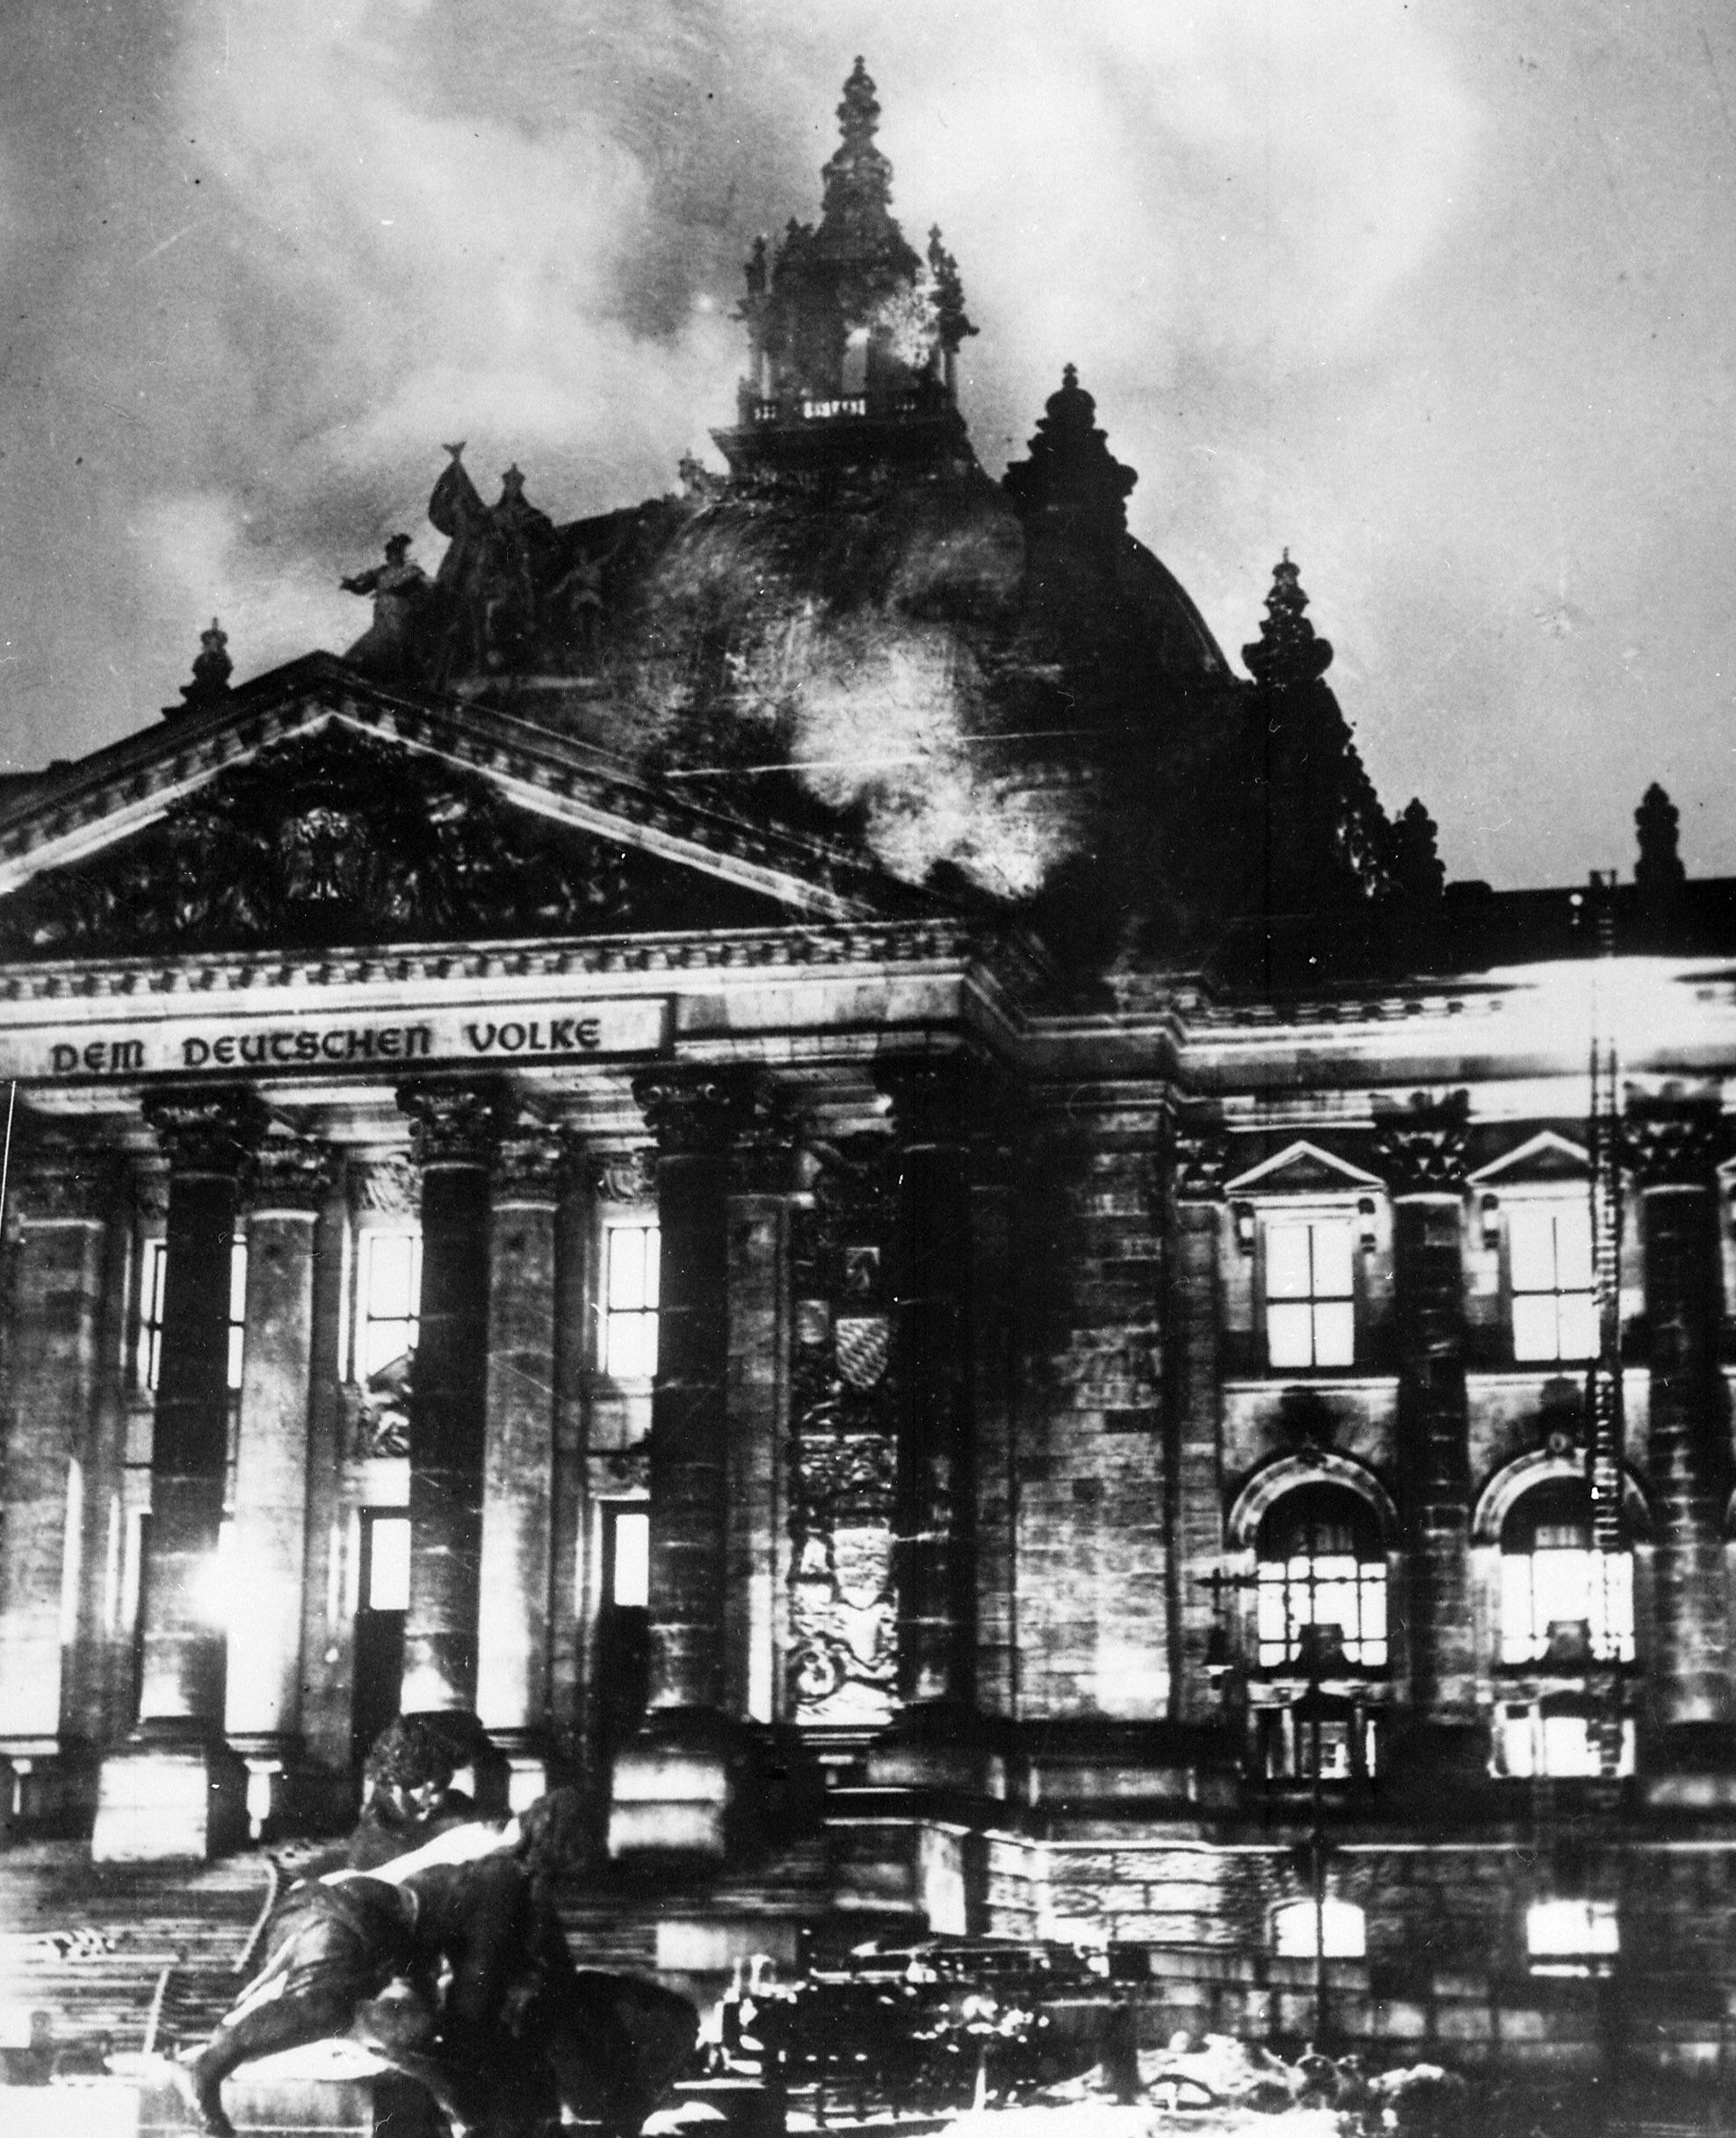 http://upload.wikimedia.org/wikipedia/commons/2/20/Reichstagsbrand.jpg